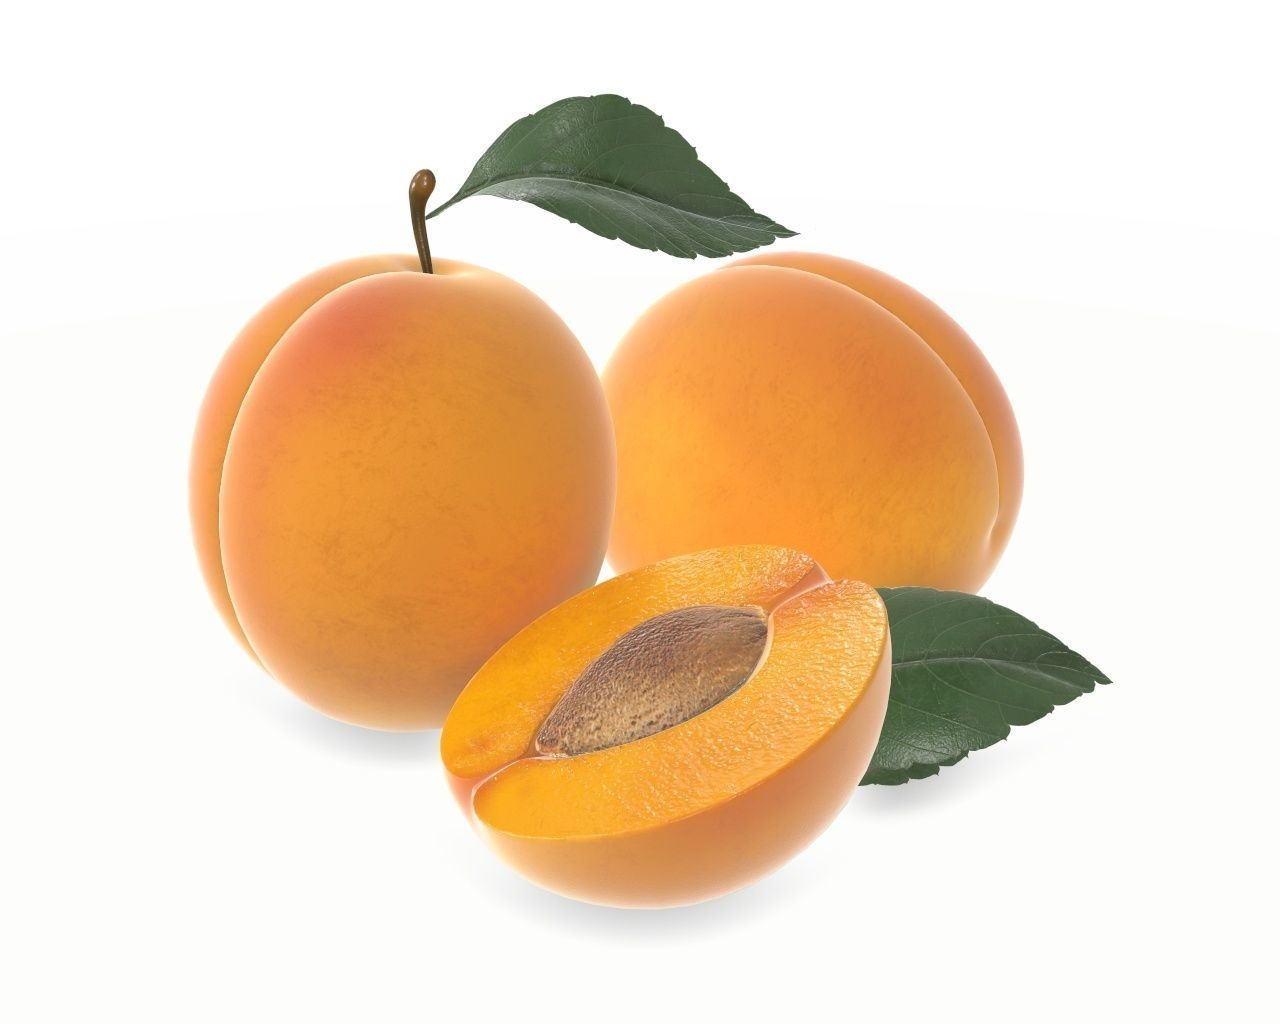 apricot fresh cut fruits with leaf